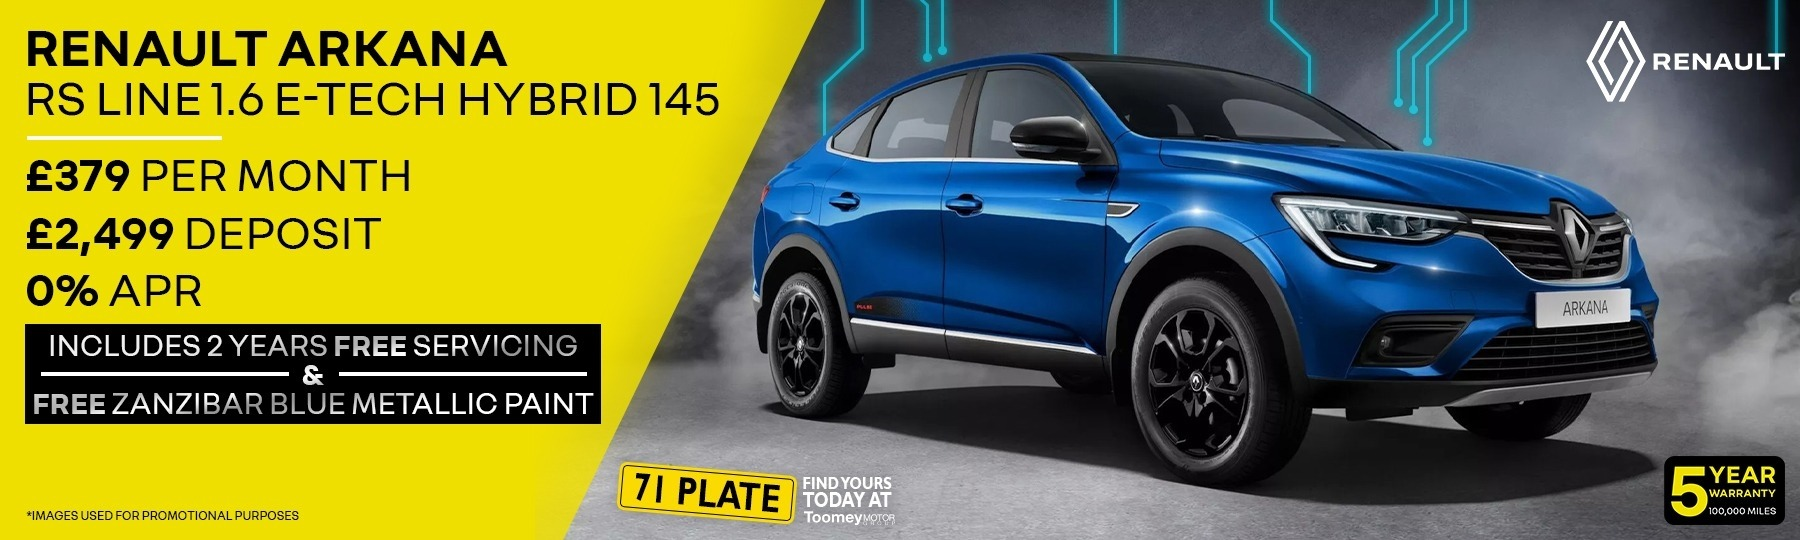 All-New Renault Arkana New Car Offer